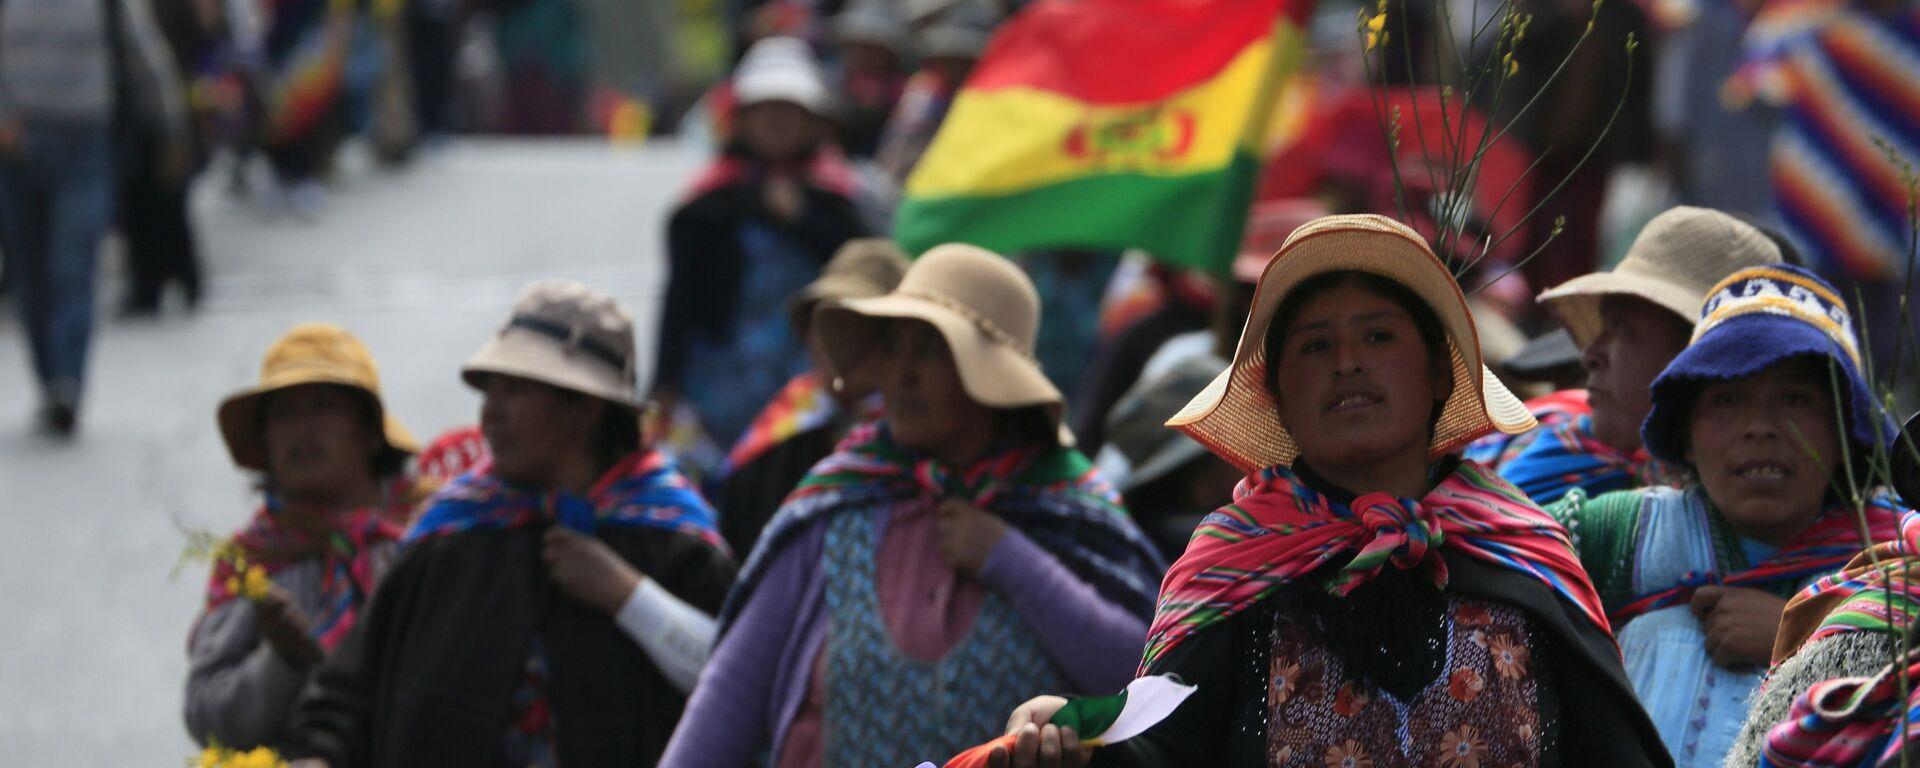 Mujeres indígenas en Bolivia - Sputnik Mundo, 1920, 19.01.2021